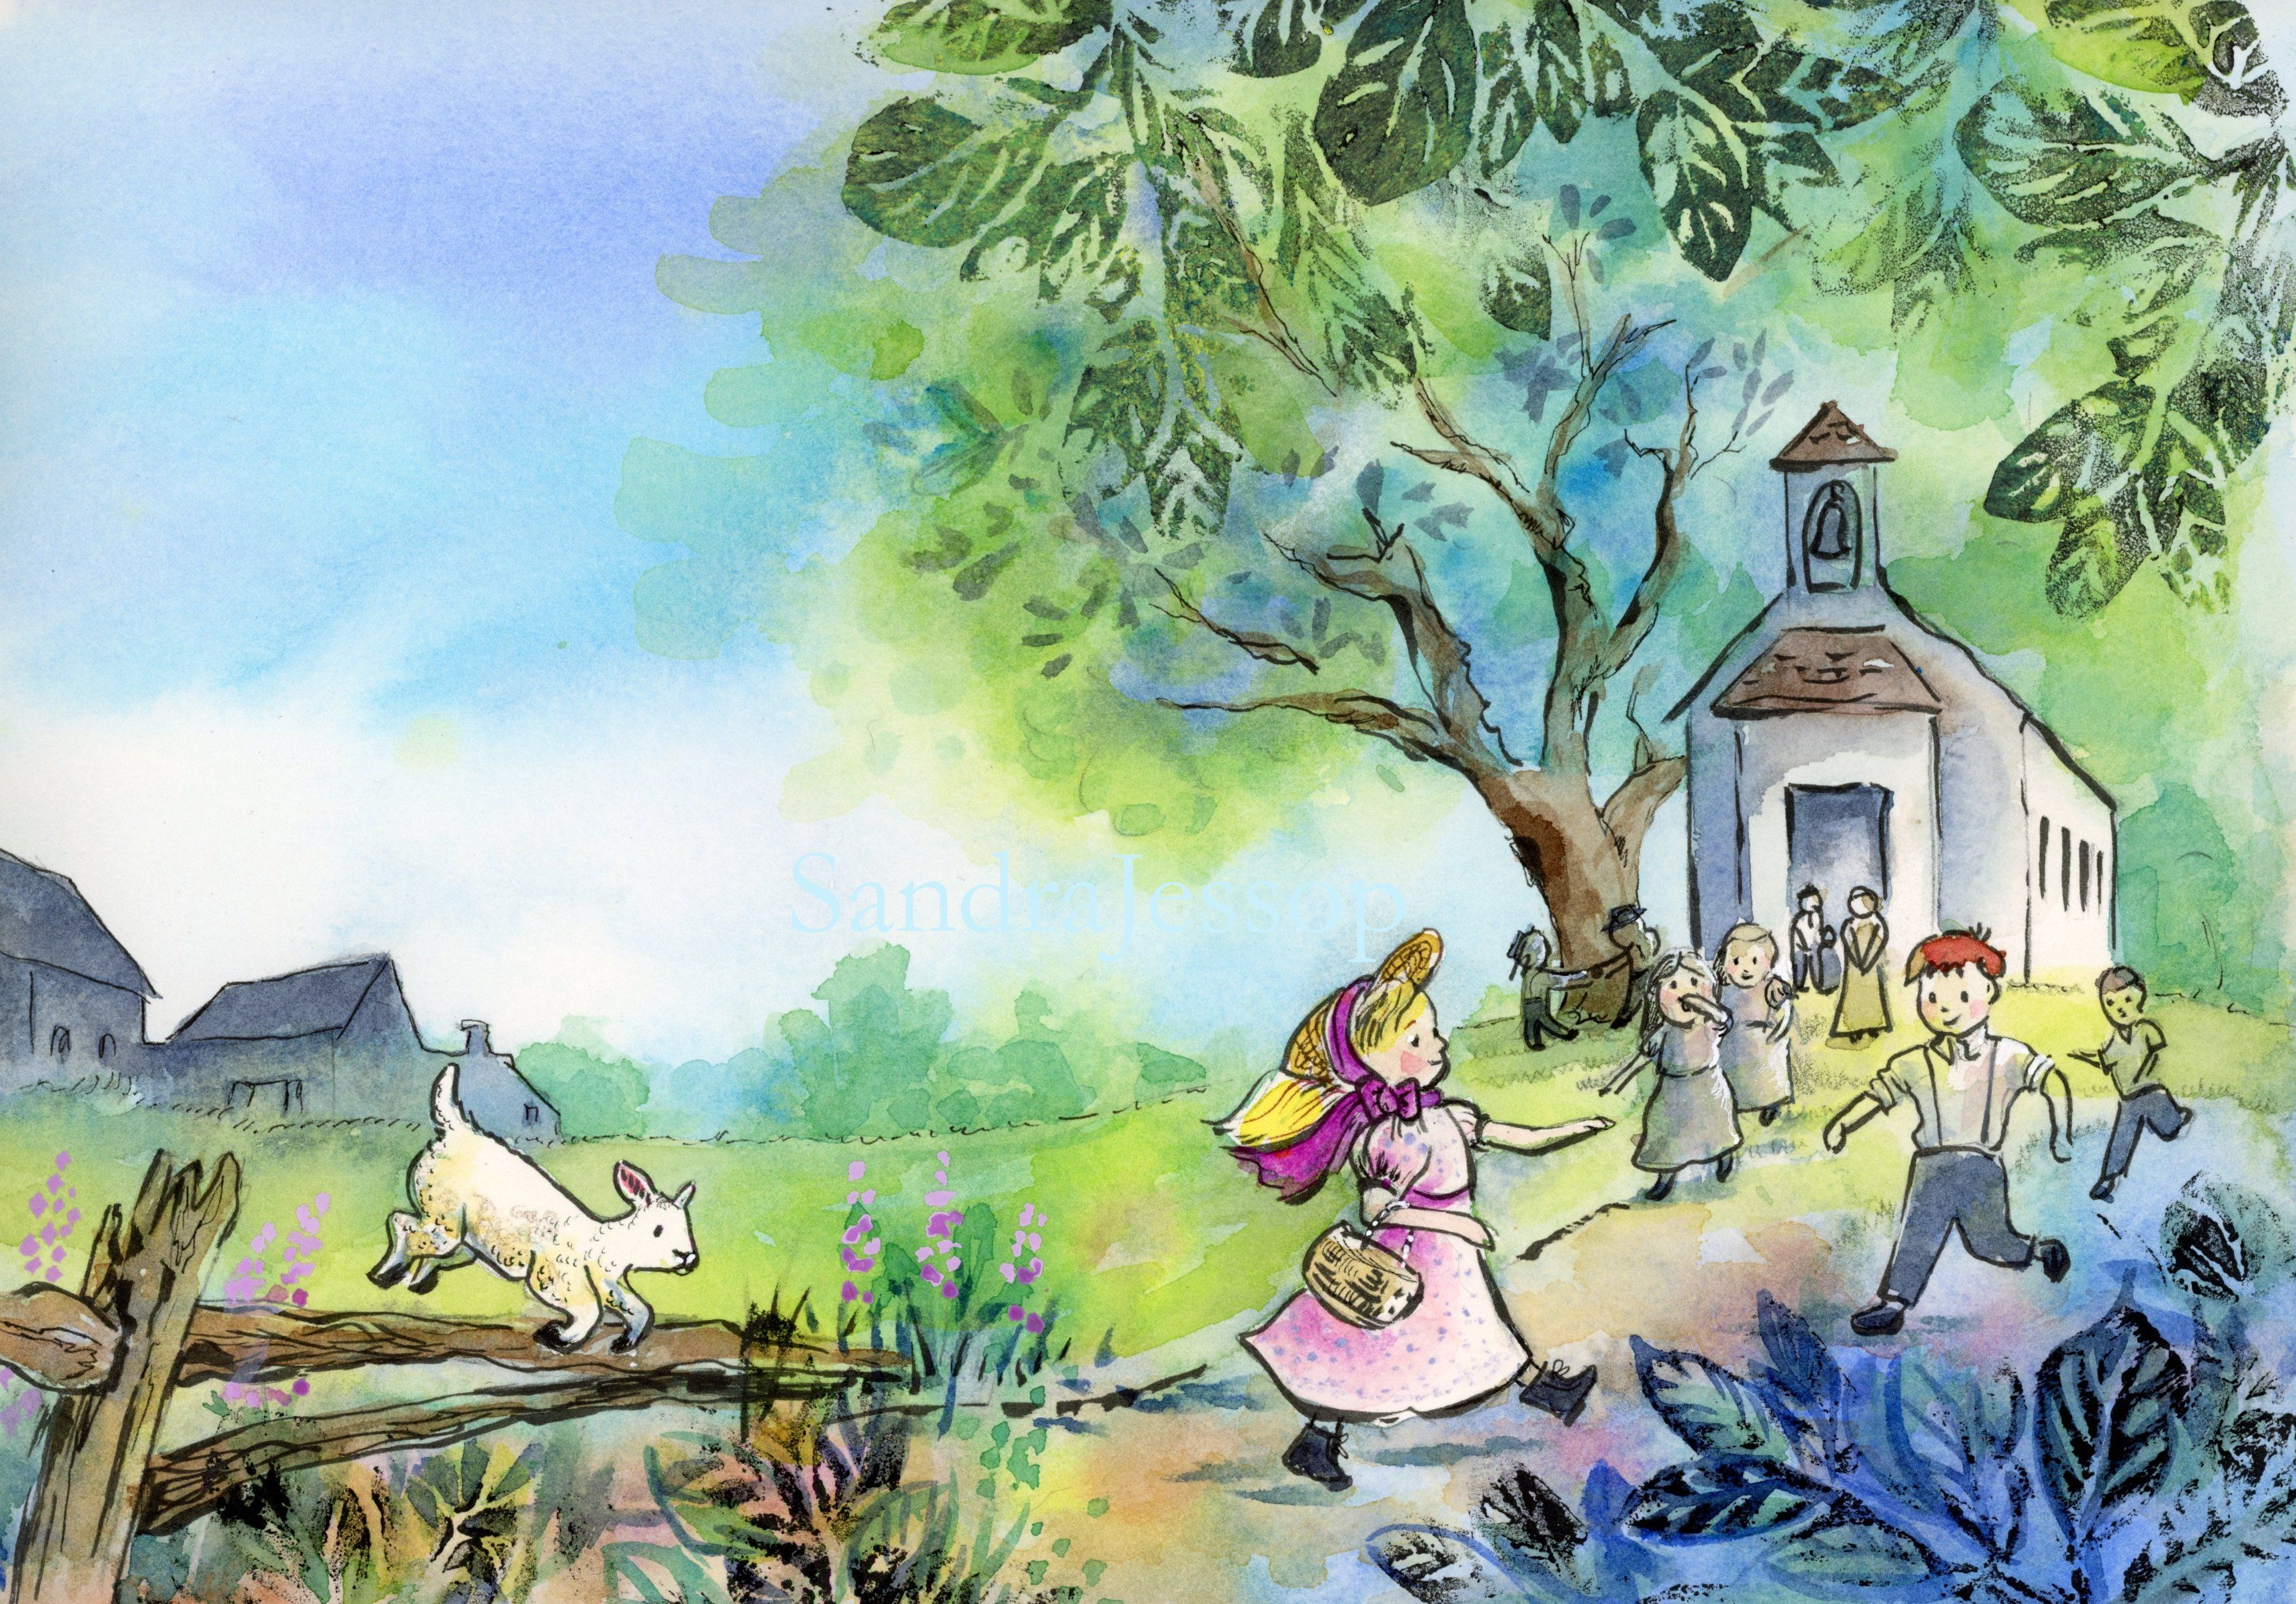 Mary Had A Little Lamb Children Book Illustration Watercolor Childrens Books Illustrations Picture Books Illustration